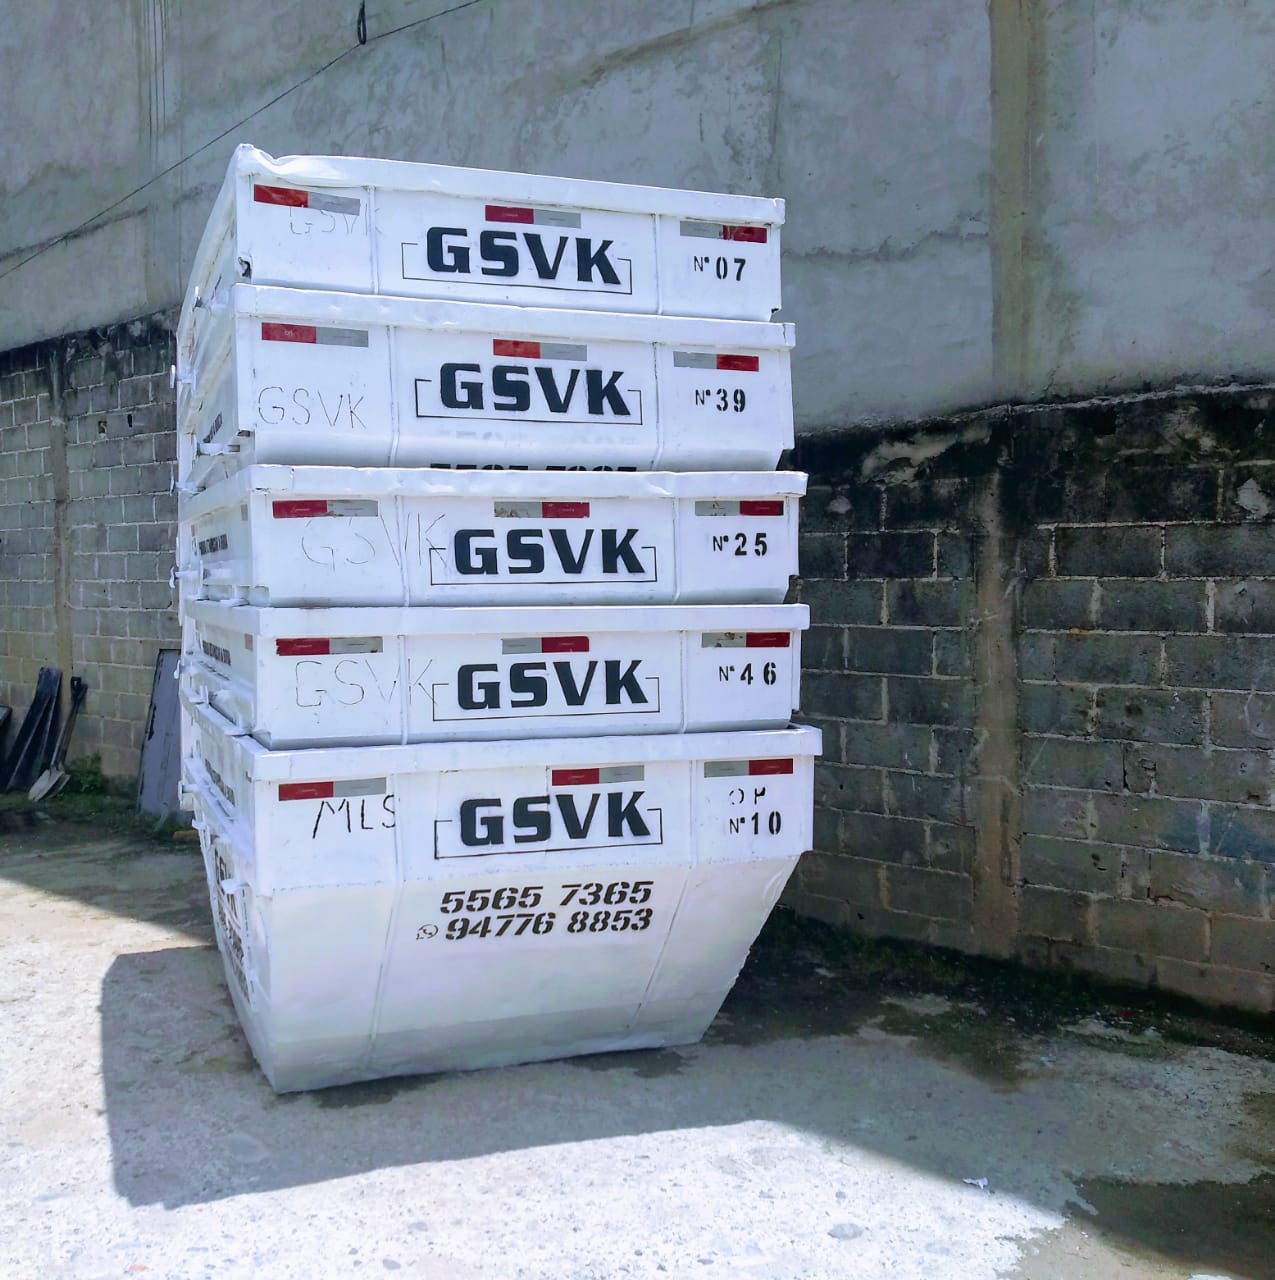 GSVK Caçambas PS